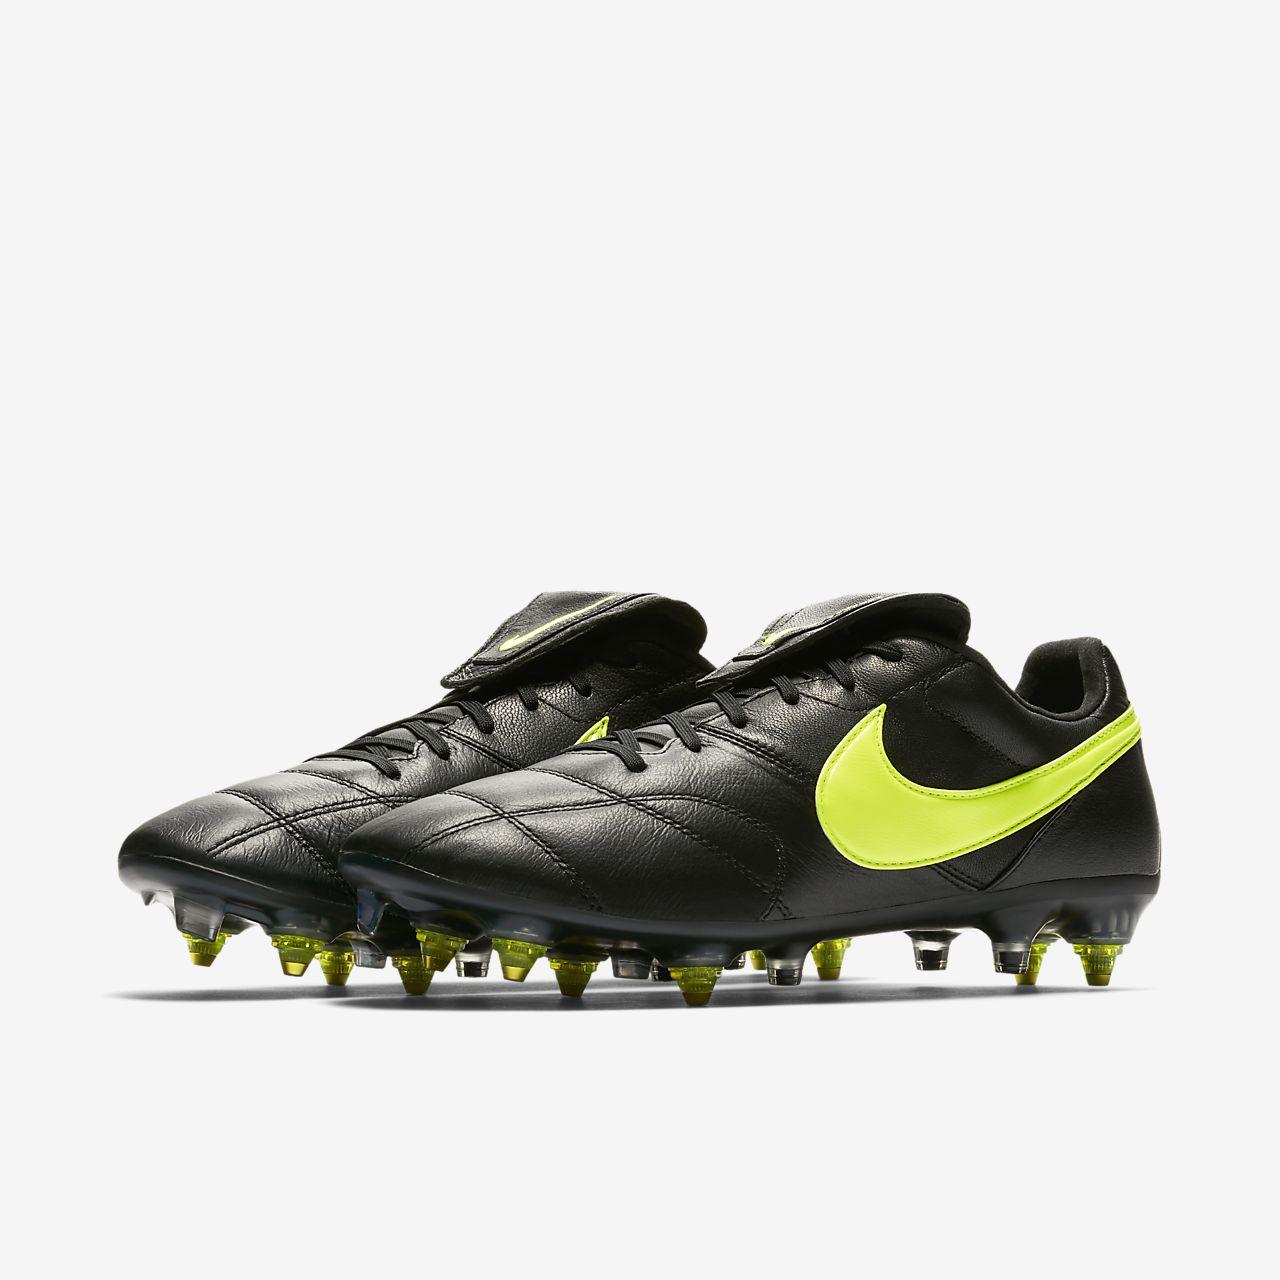 Premier Chaussure Soft Ground De Clog Nike Football Ii Anti D9WEH2IY